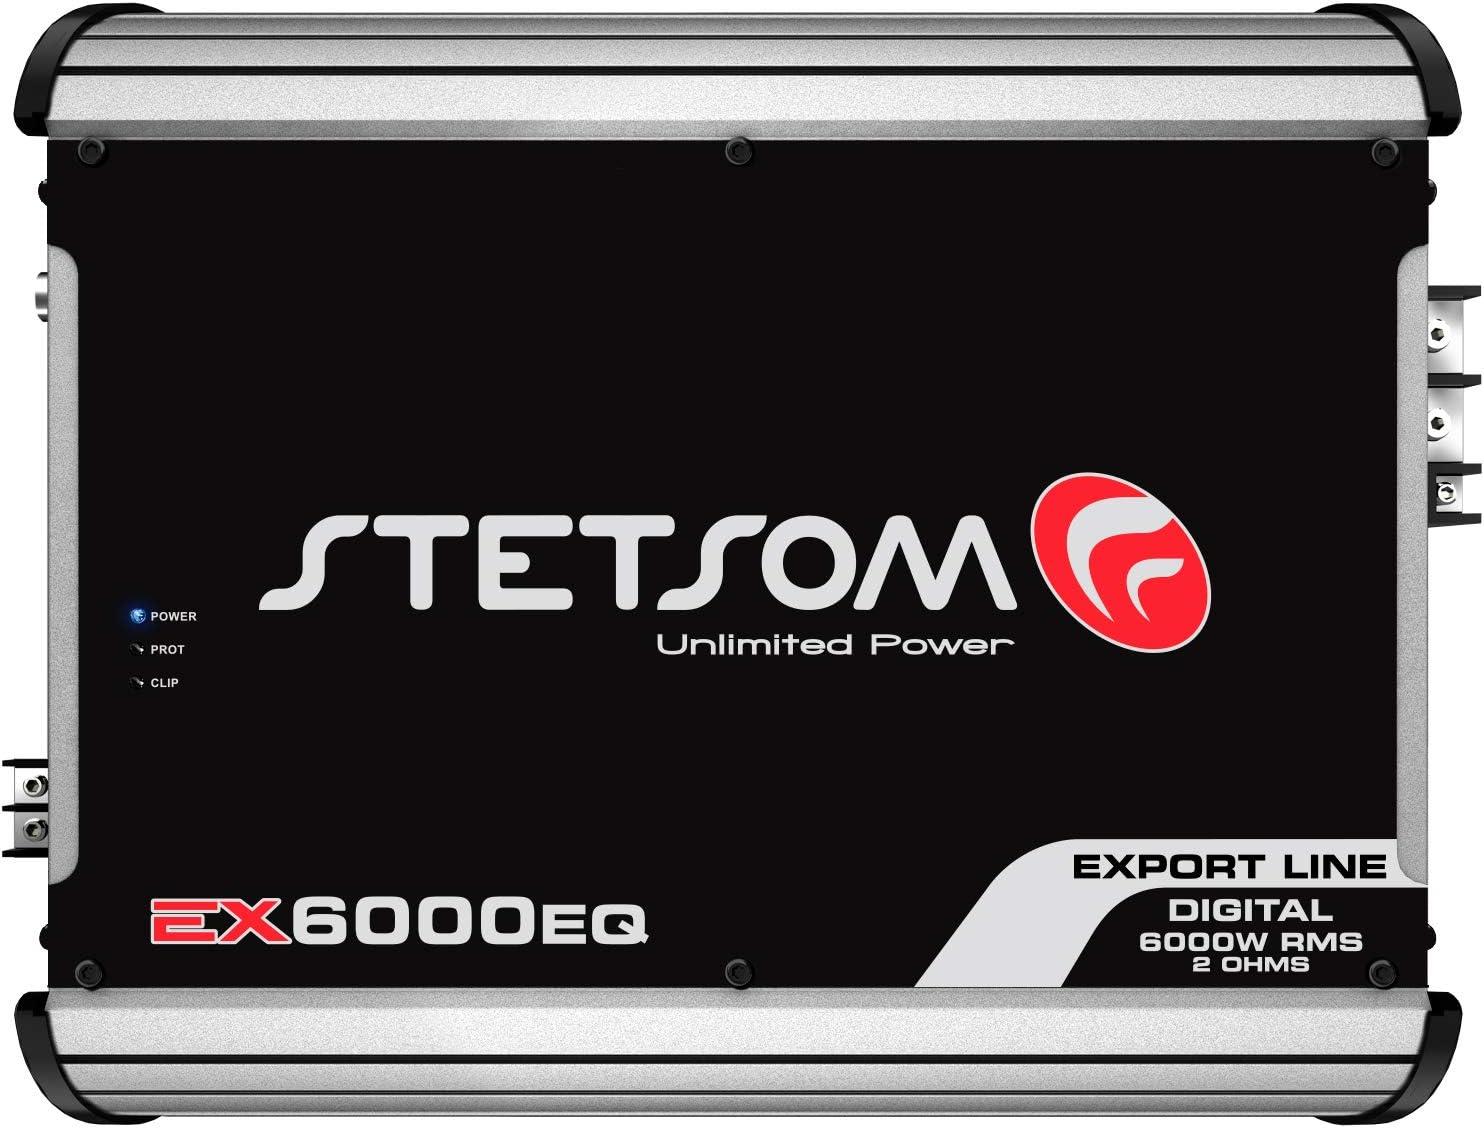 Stetsom EX 6000 EQ 2 Ohms Class D Full Range Mono Amplifier